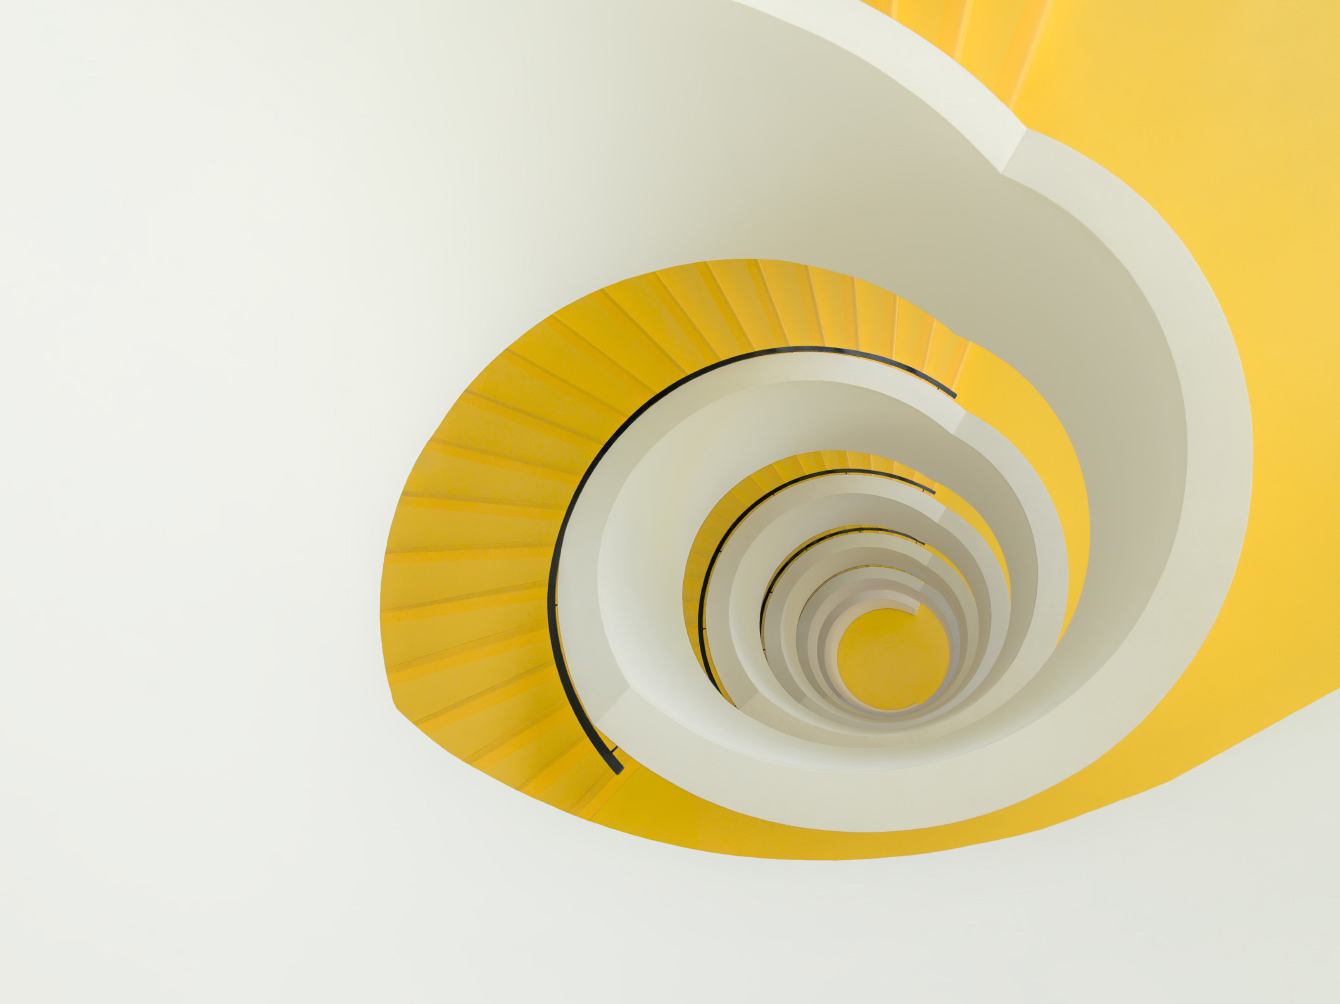 bibliotheque-universitaire-Lyon-Thierry-Van-de-Wyngaert